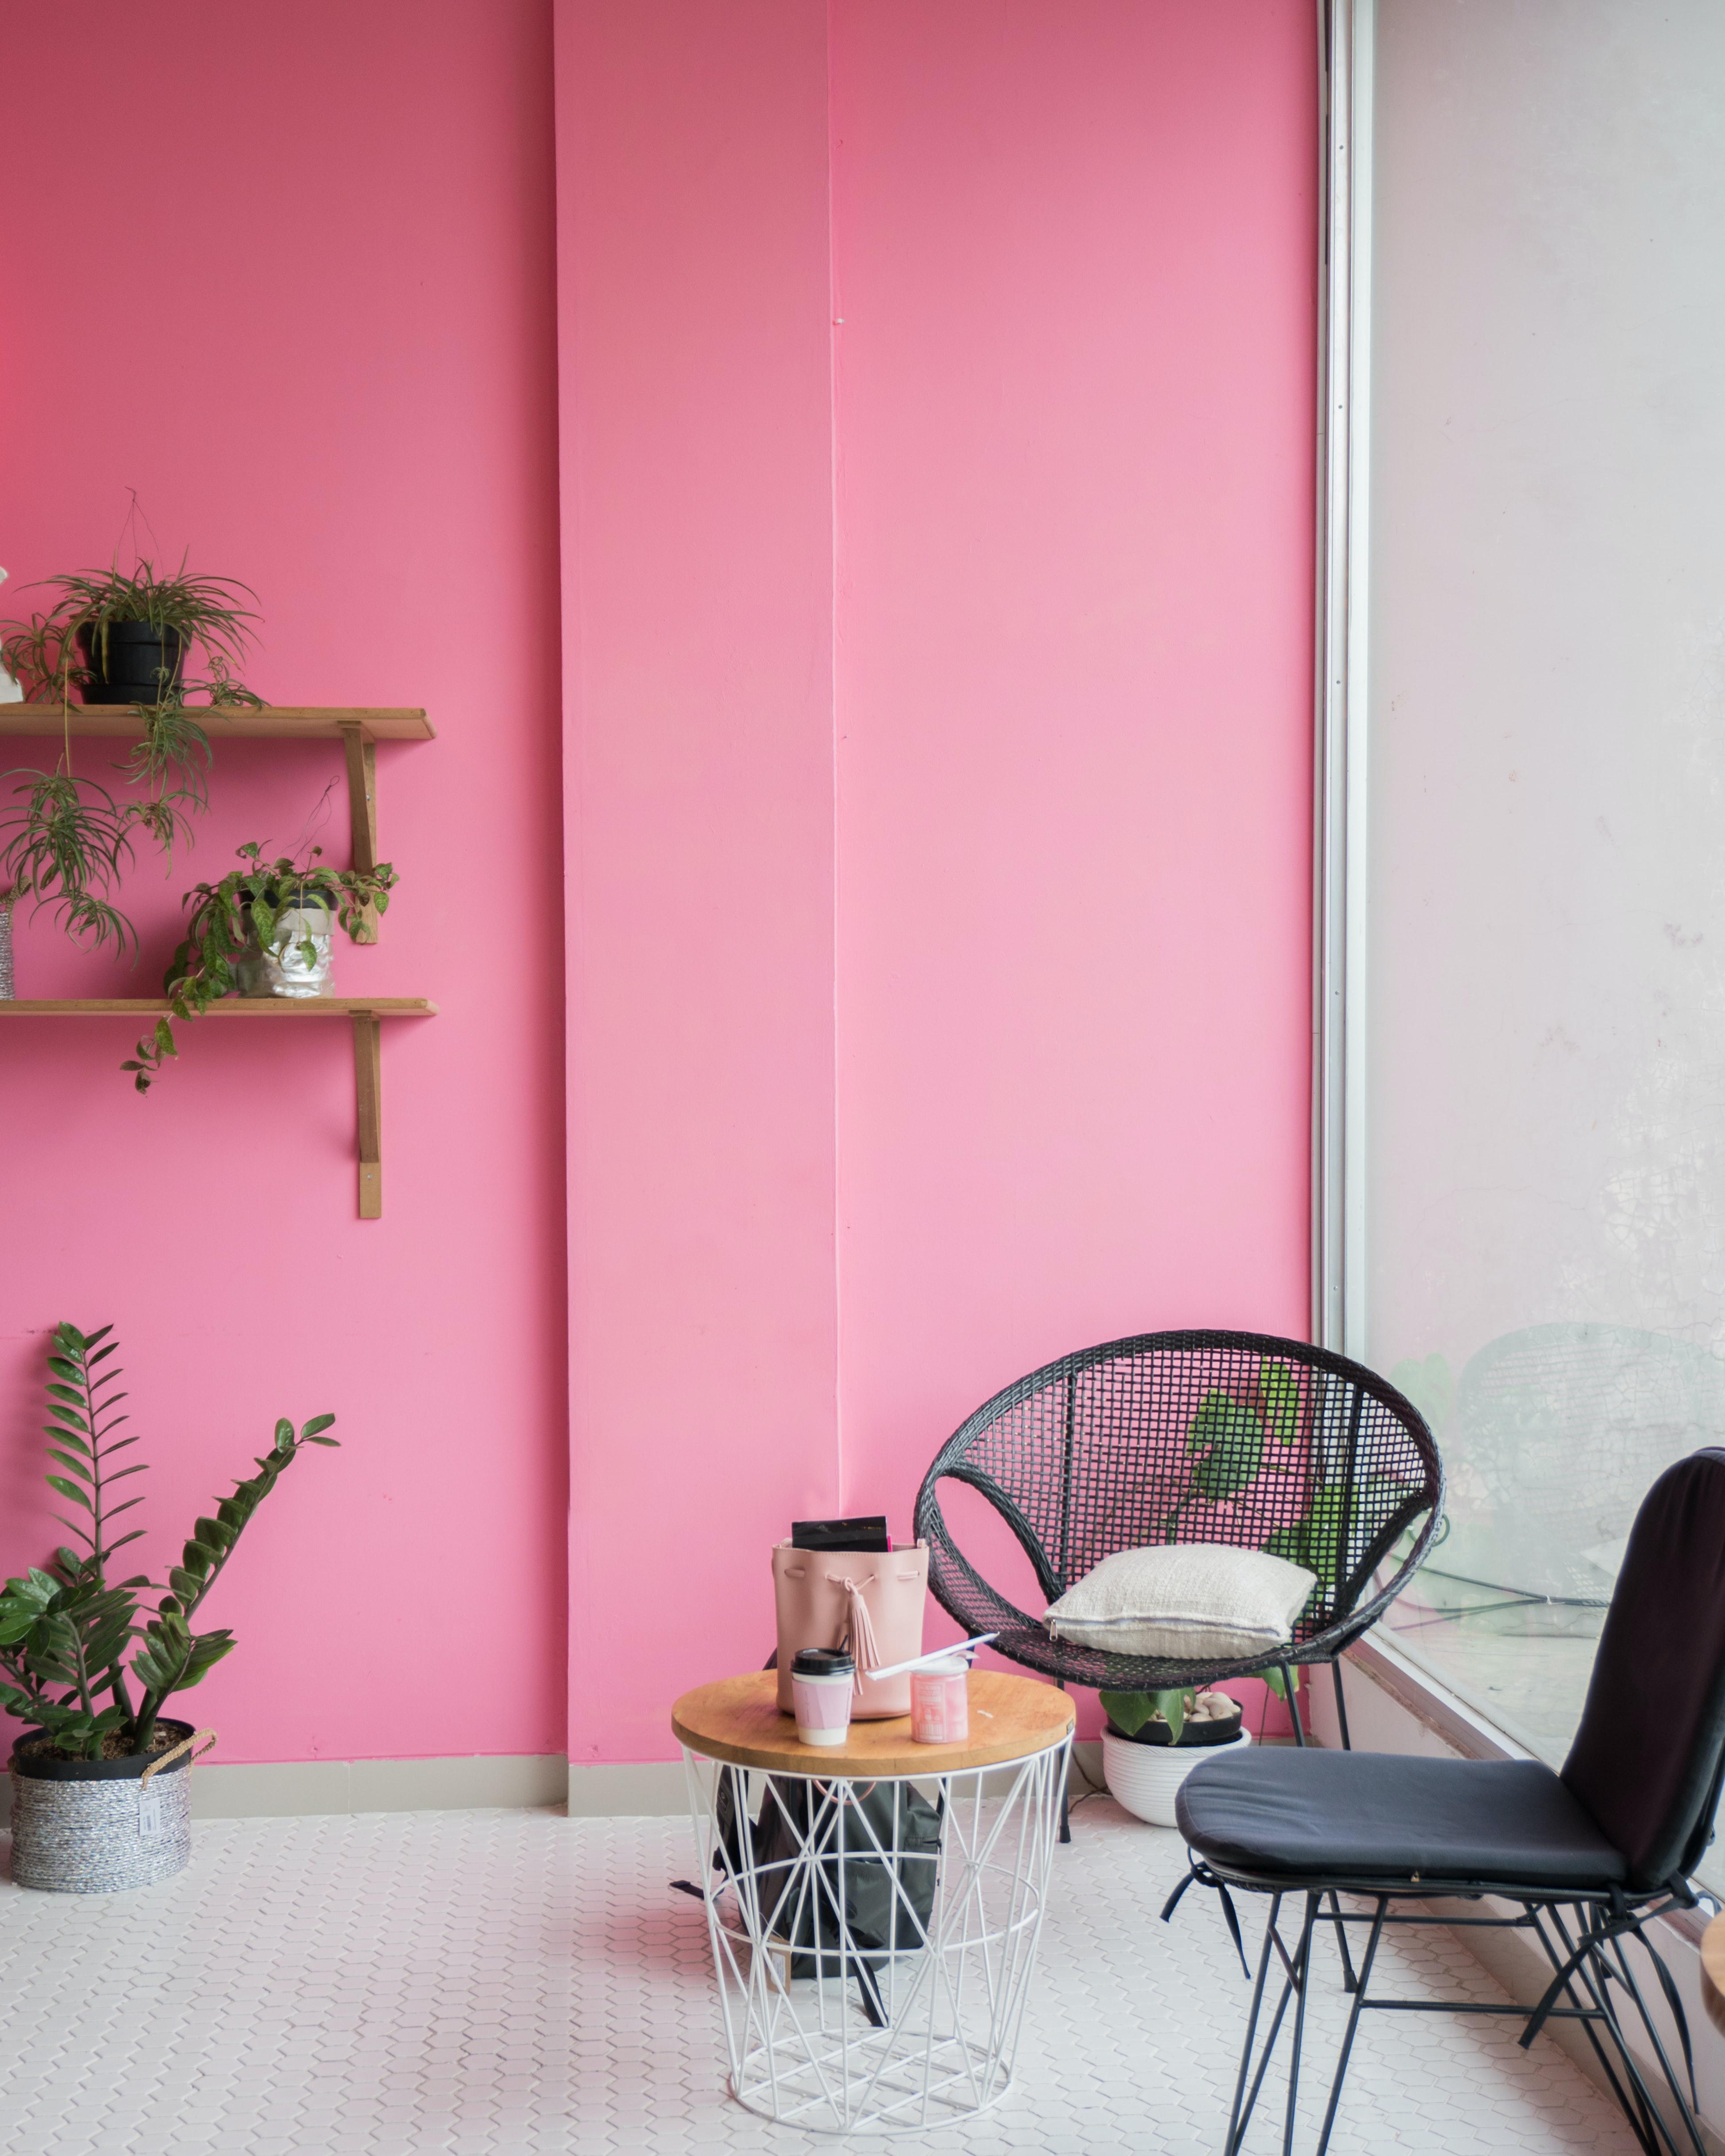 interior design pictures hd download free images on unsplash